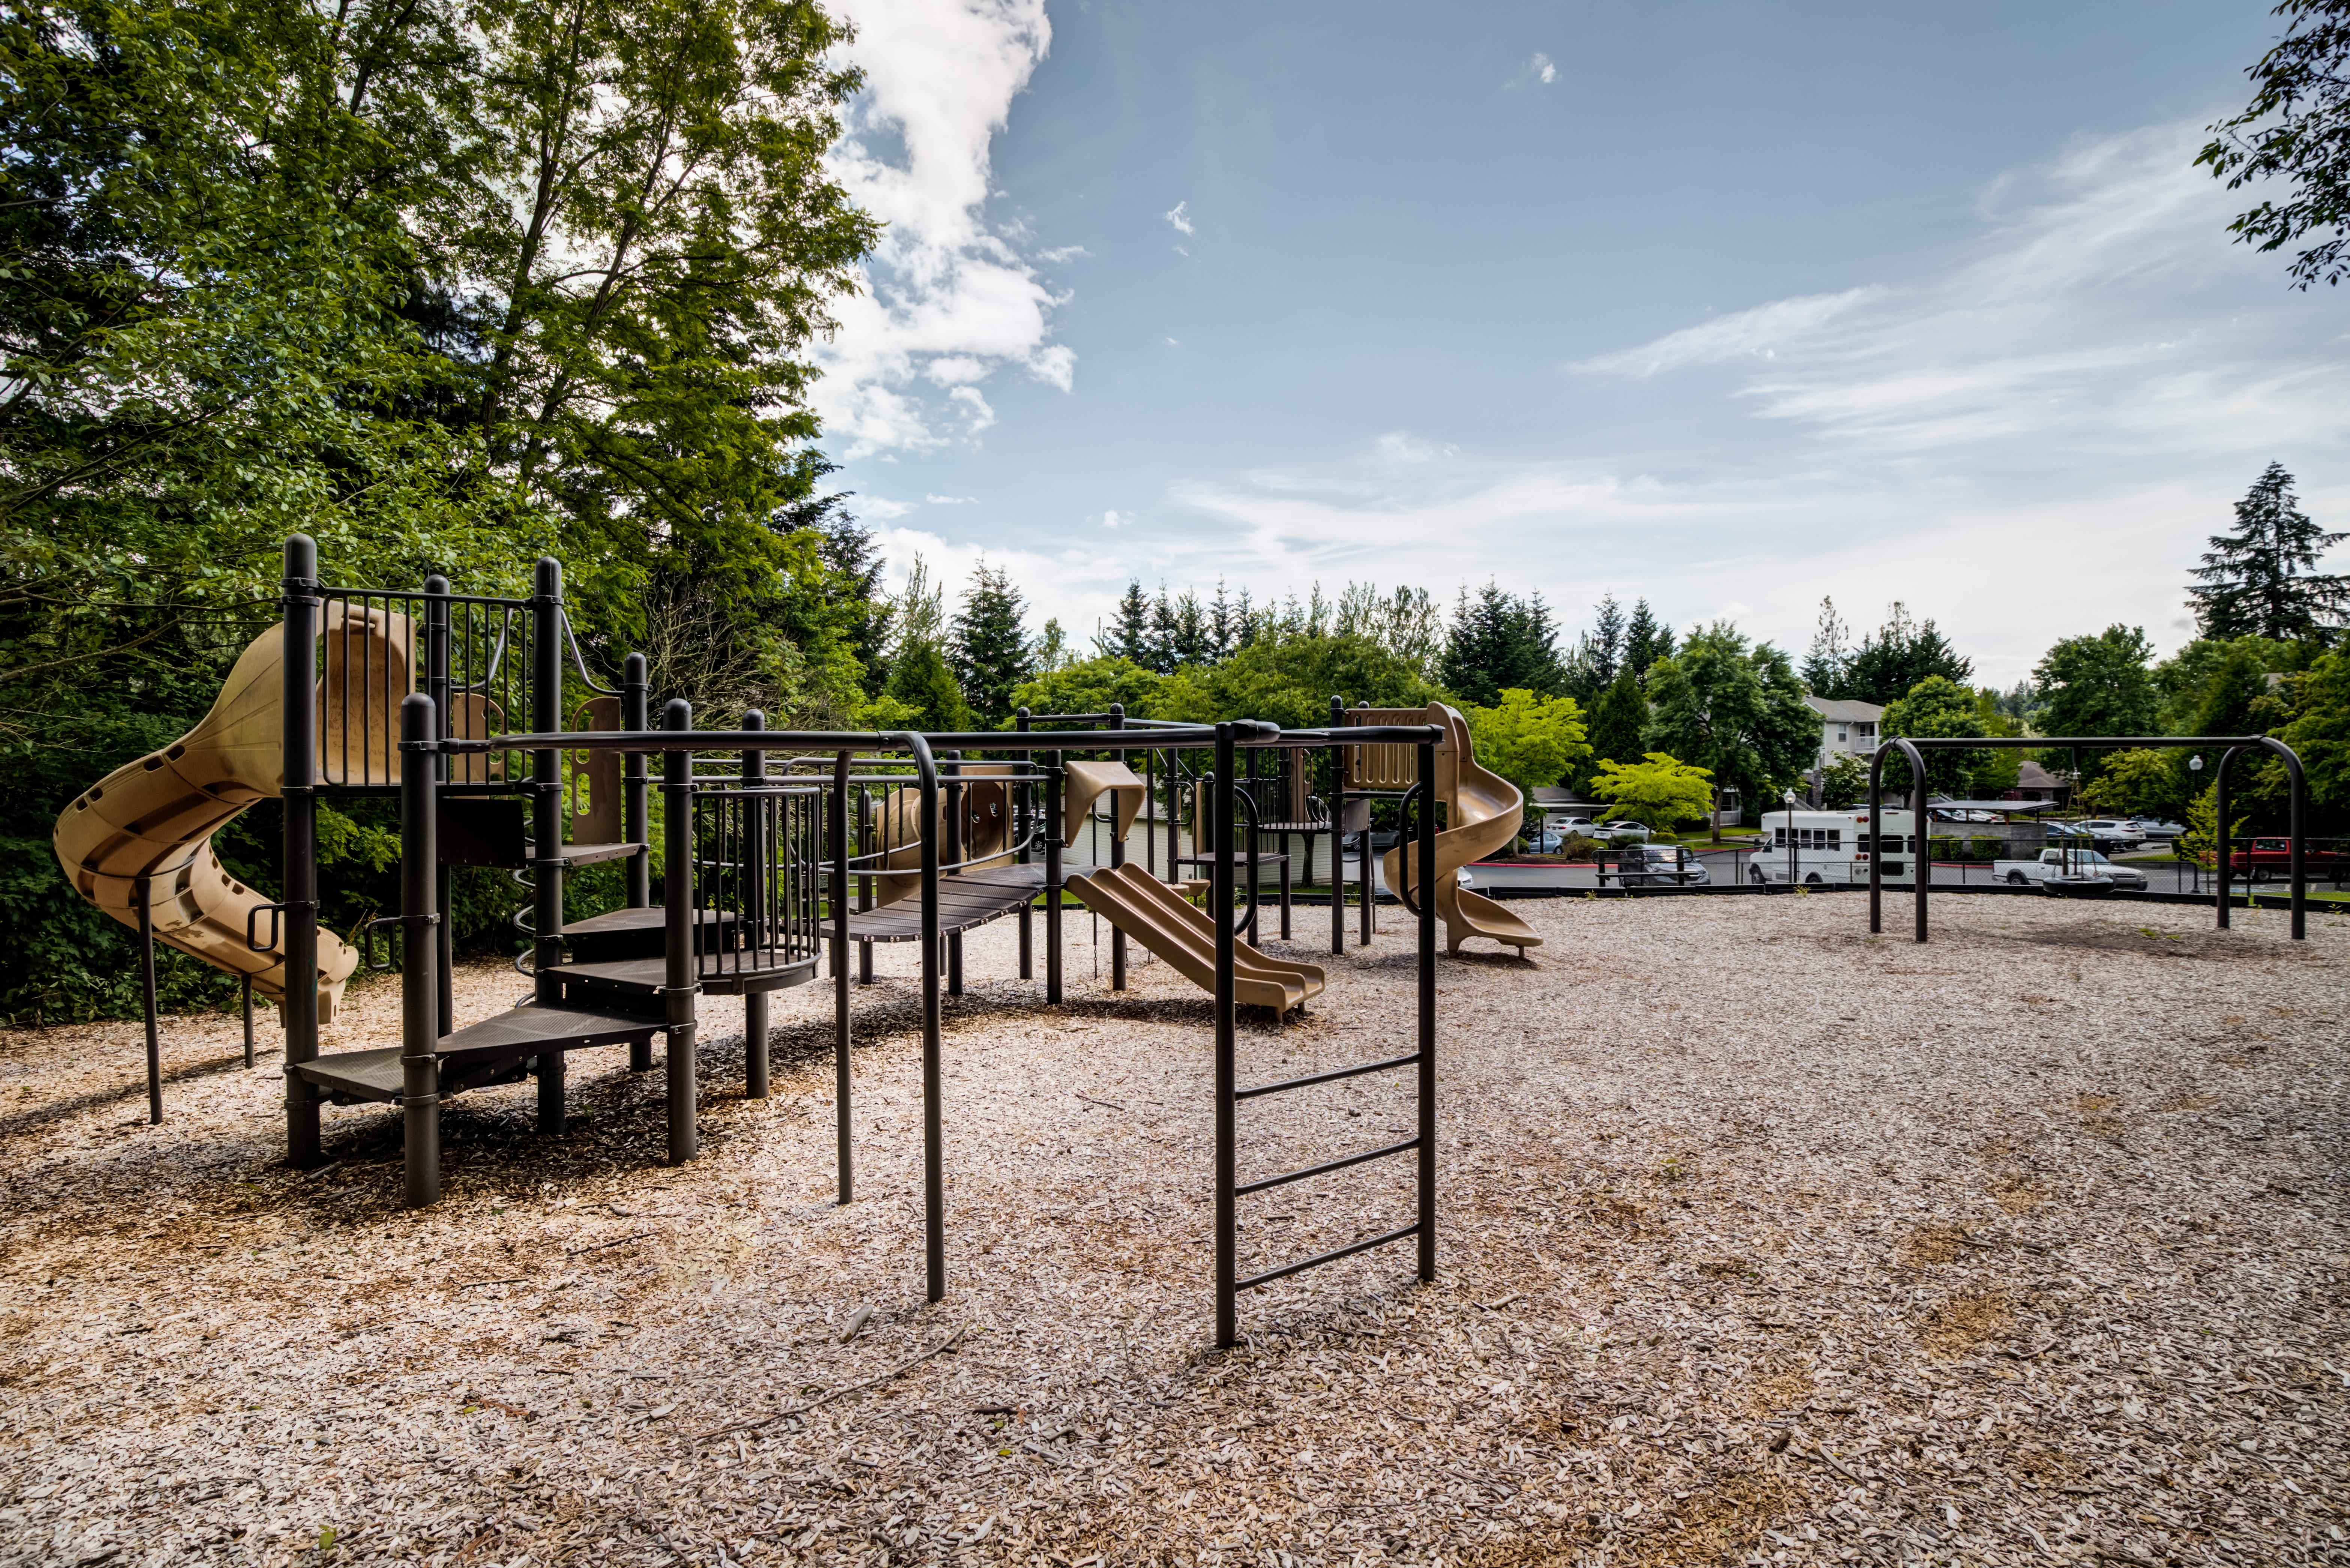 Onsite playground at The Knolls at Inglewood Hill in Sammamish, Washington